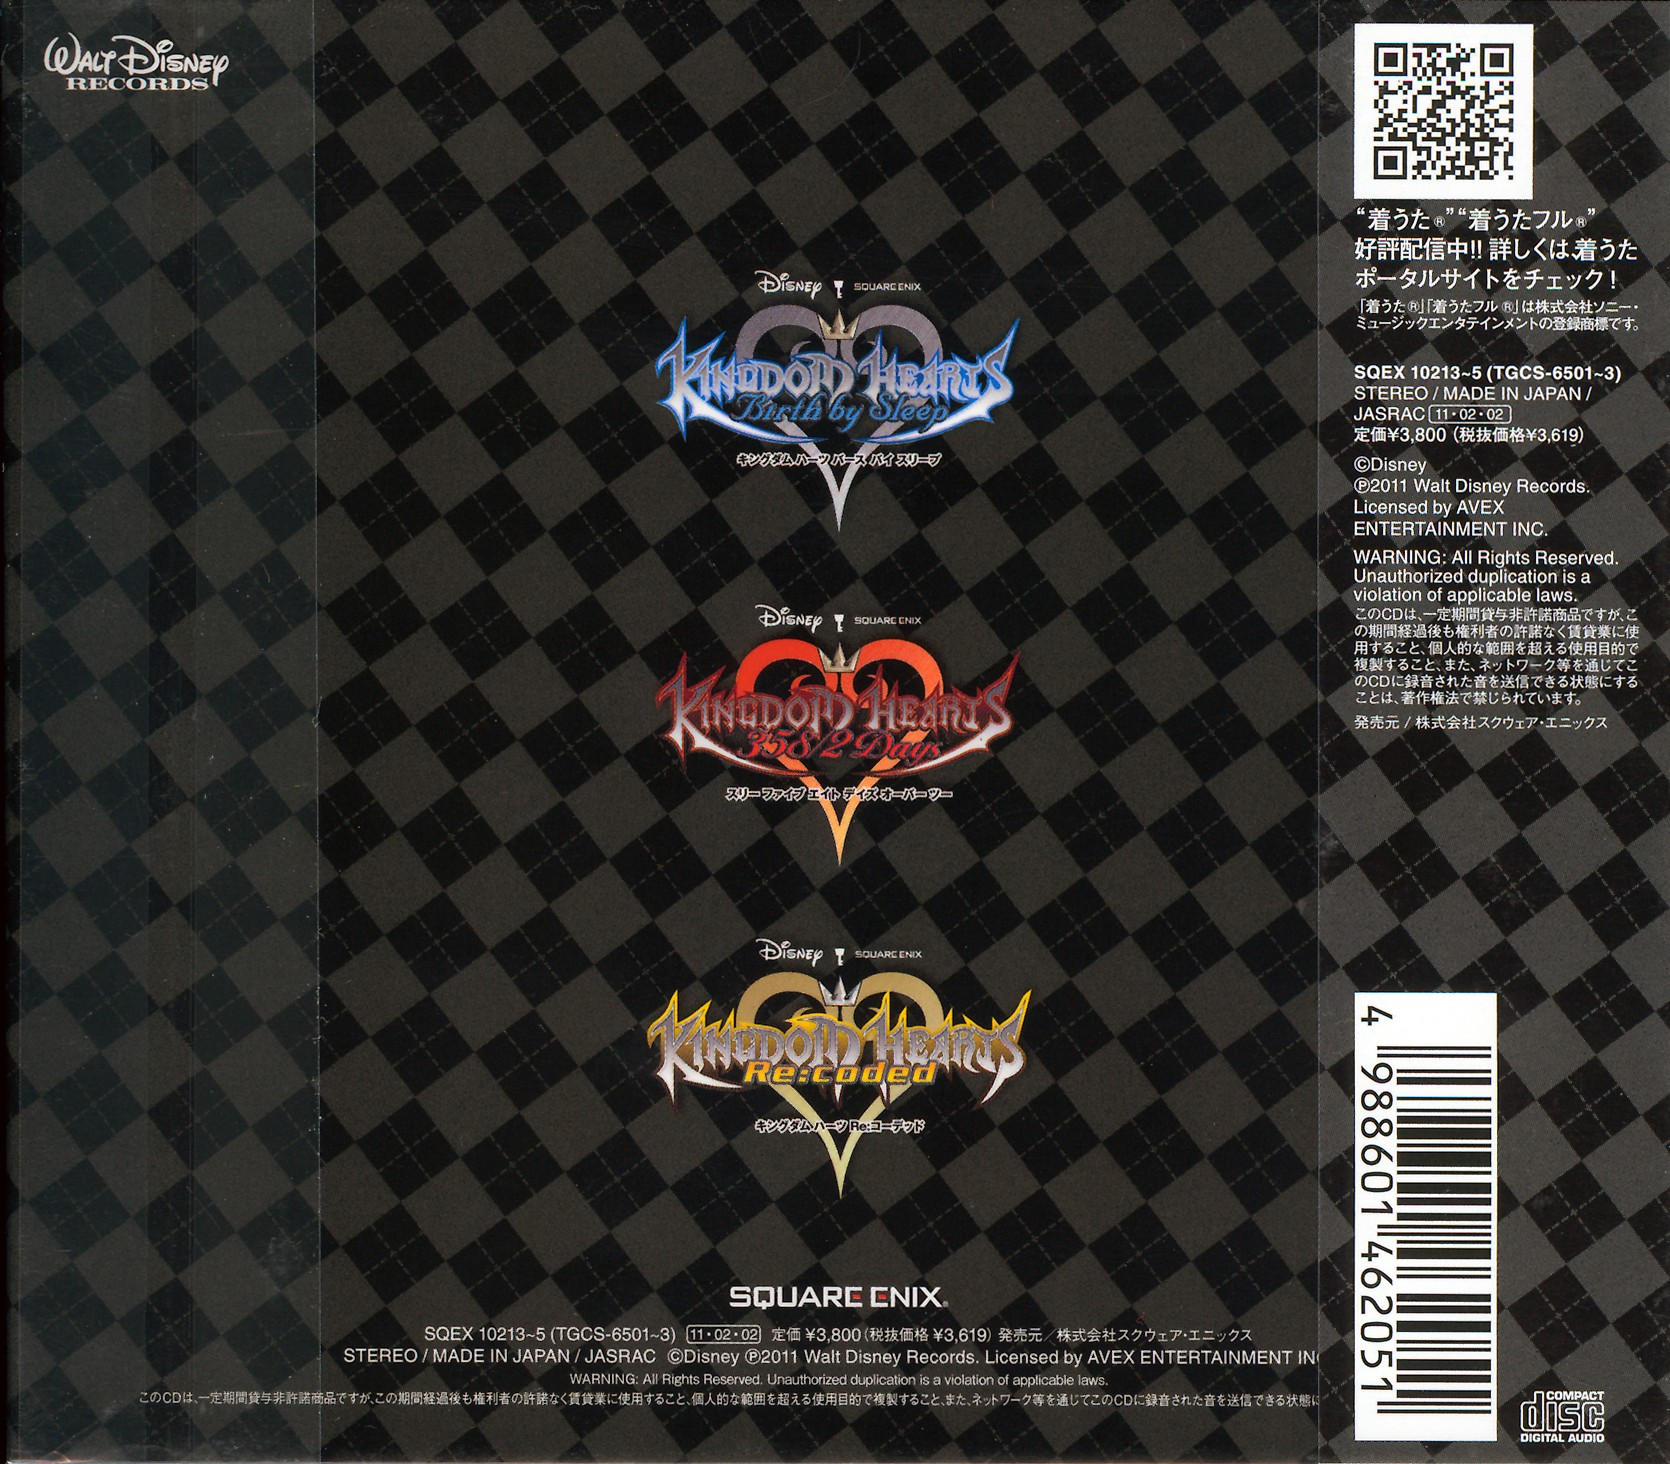 KINGDOM HEARTS -HD & ReMIX- Soundtrack BOX (by Yoko Shimomura)